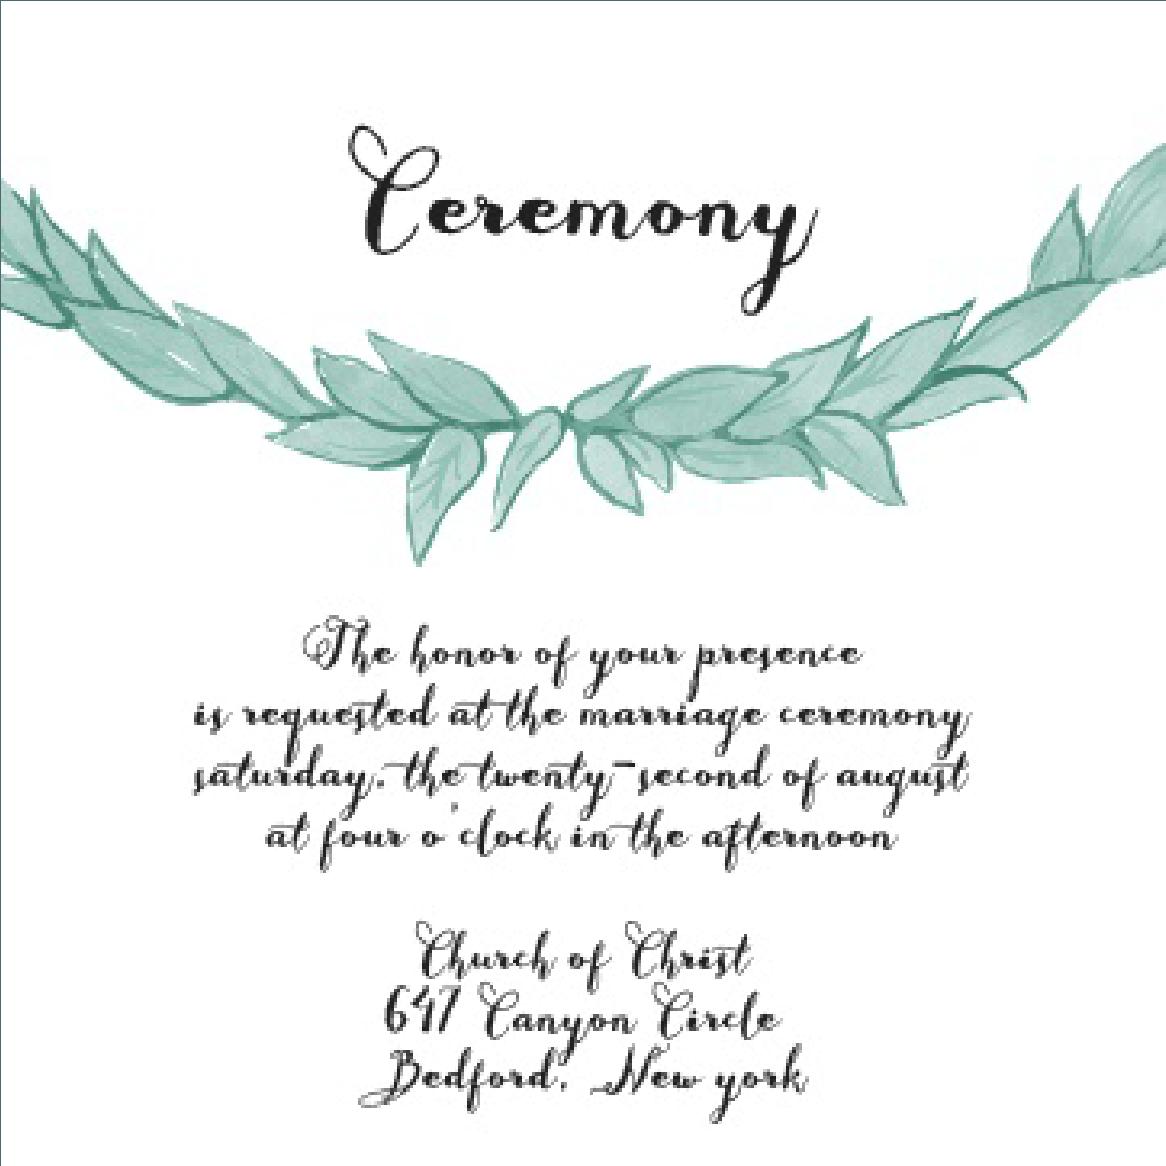 Ceremony Card Image